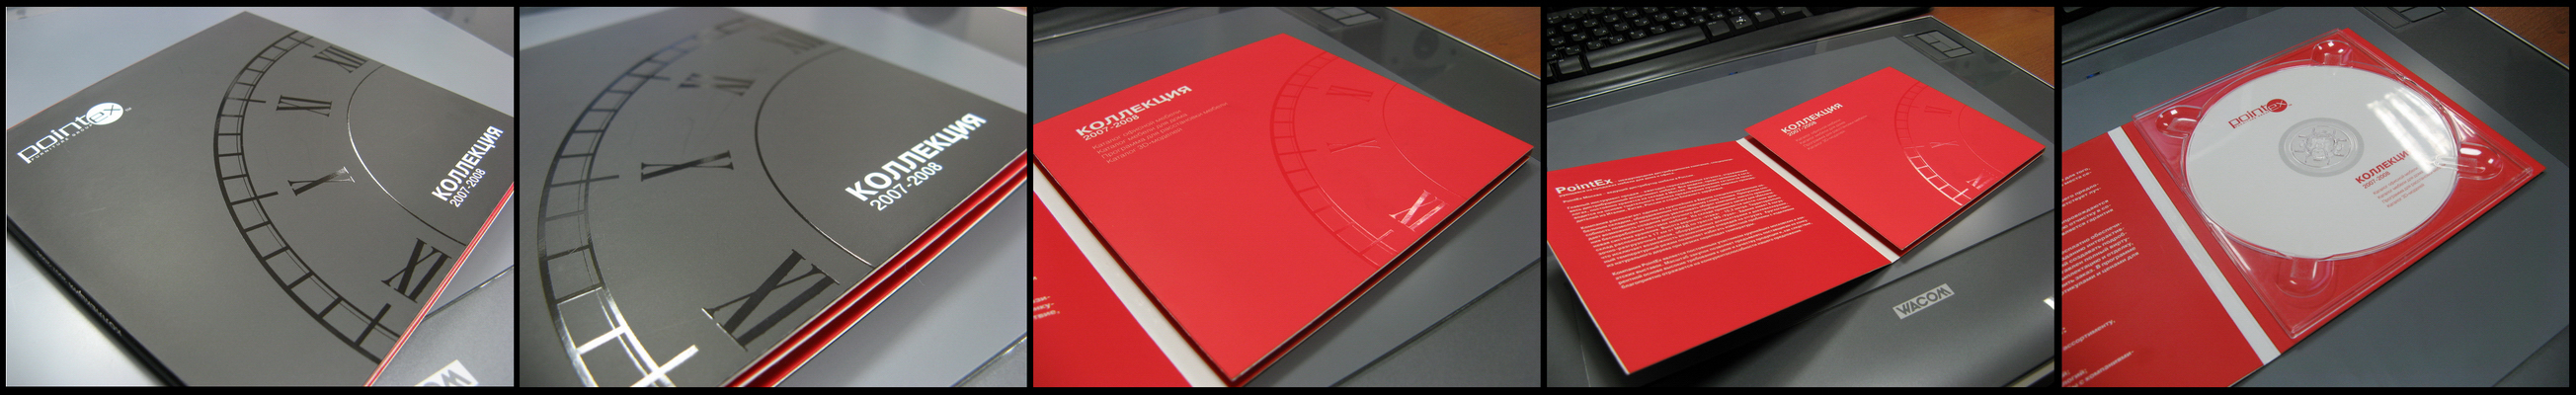 furniture collection CD by serhos-zen